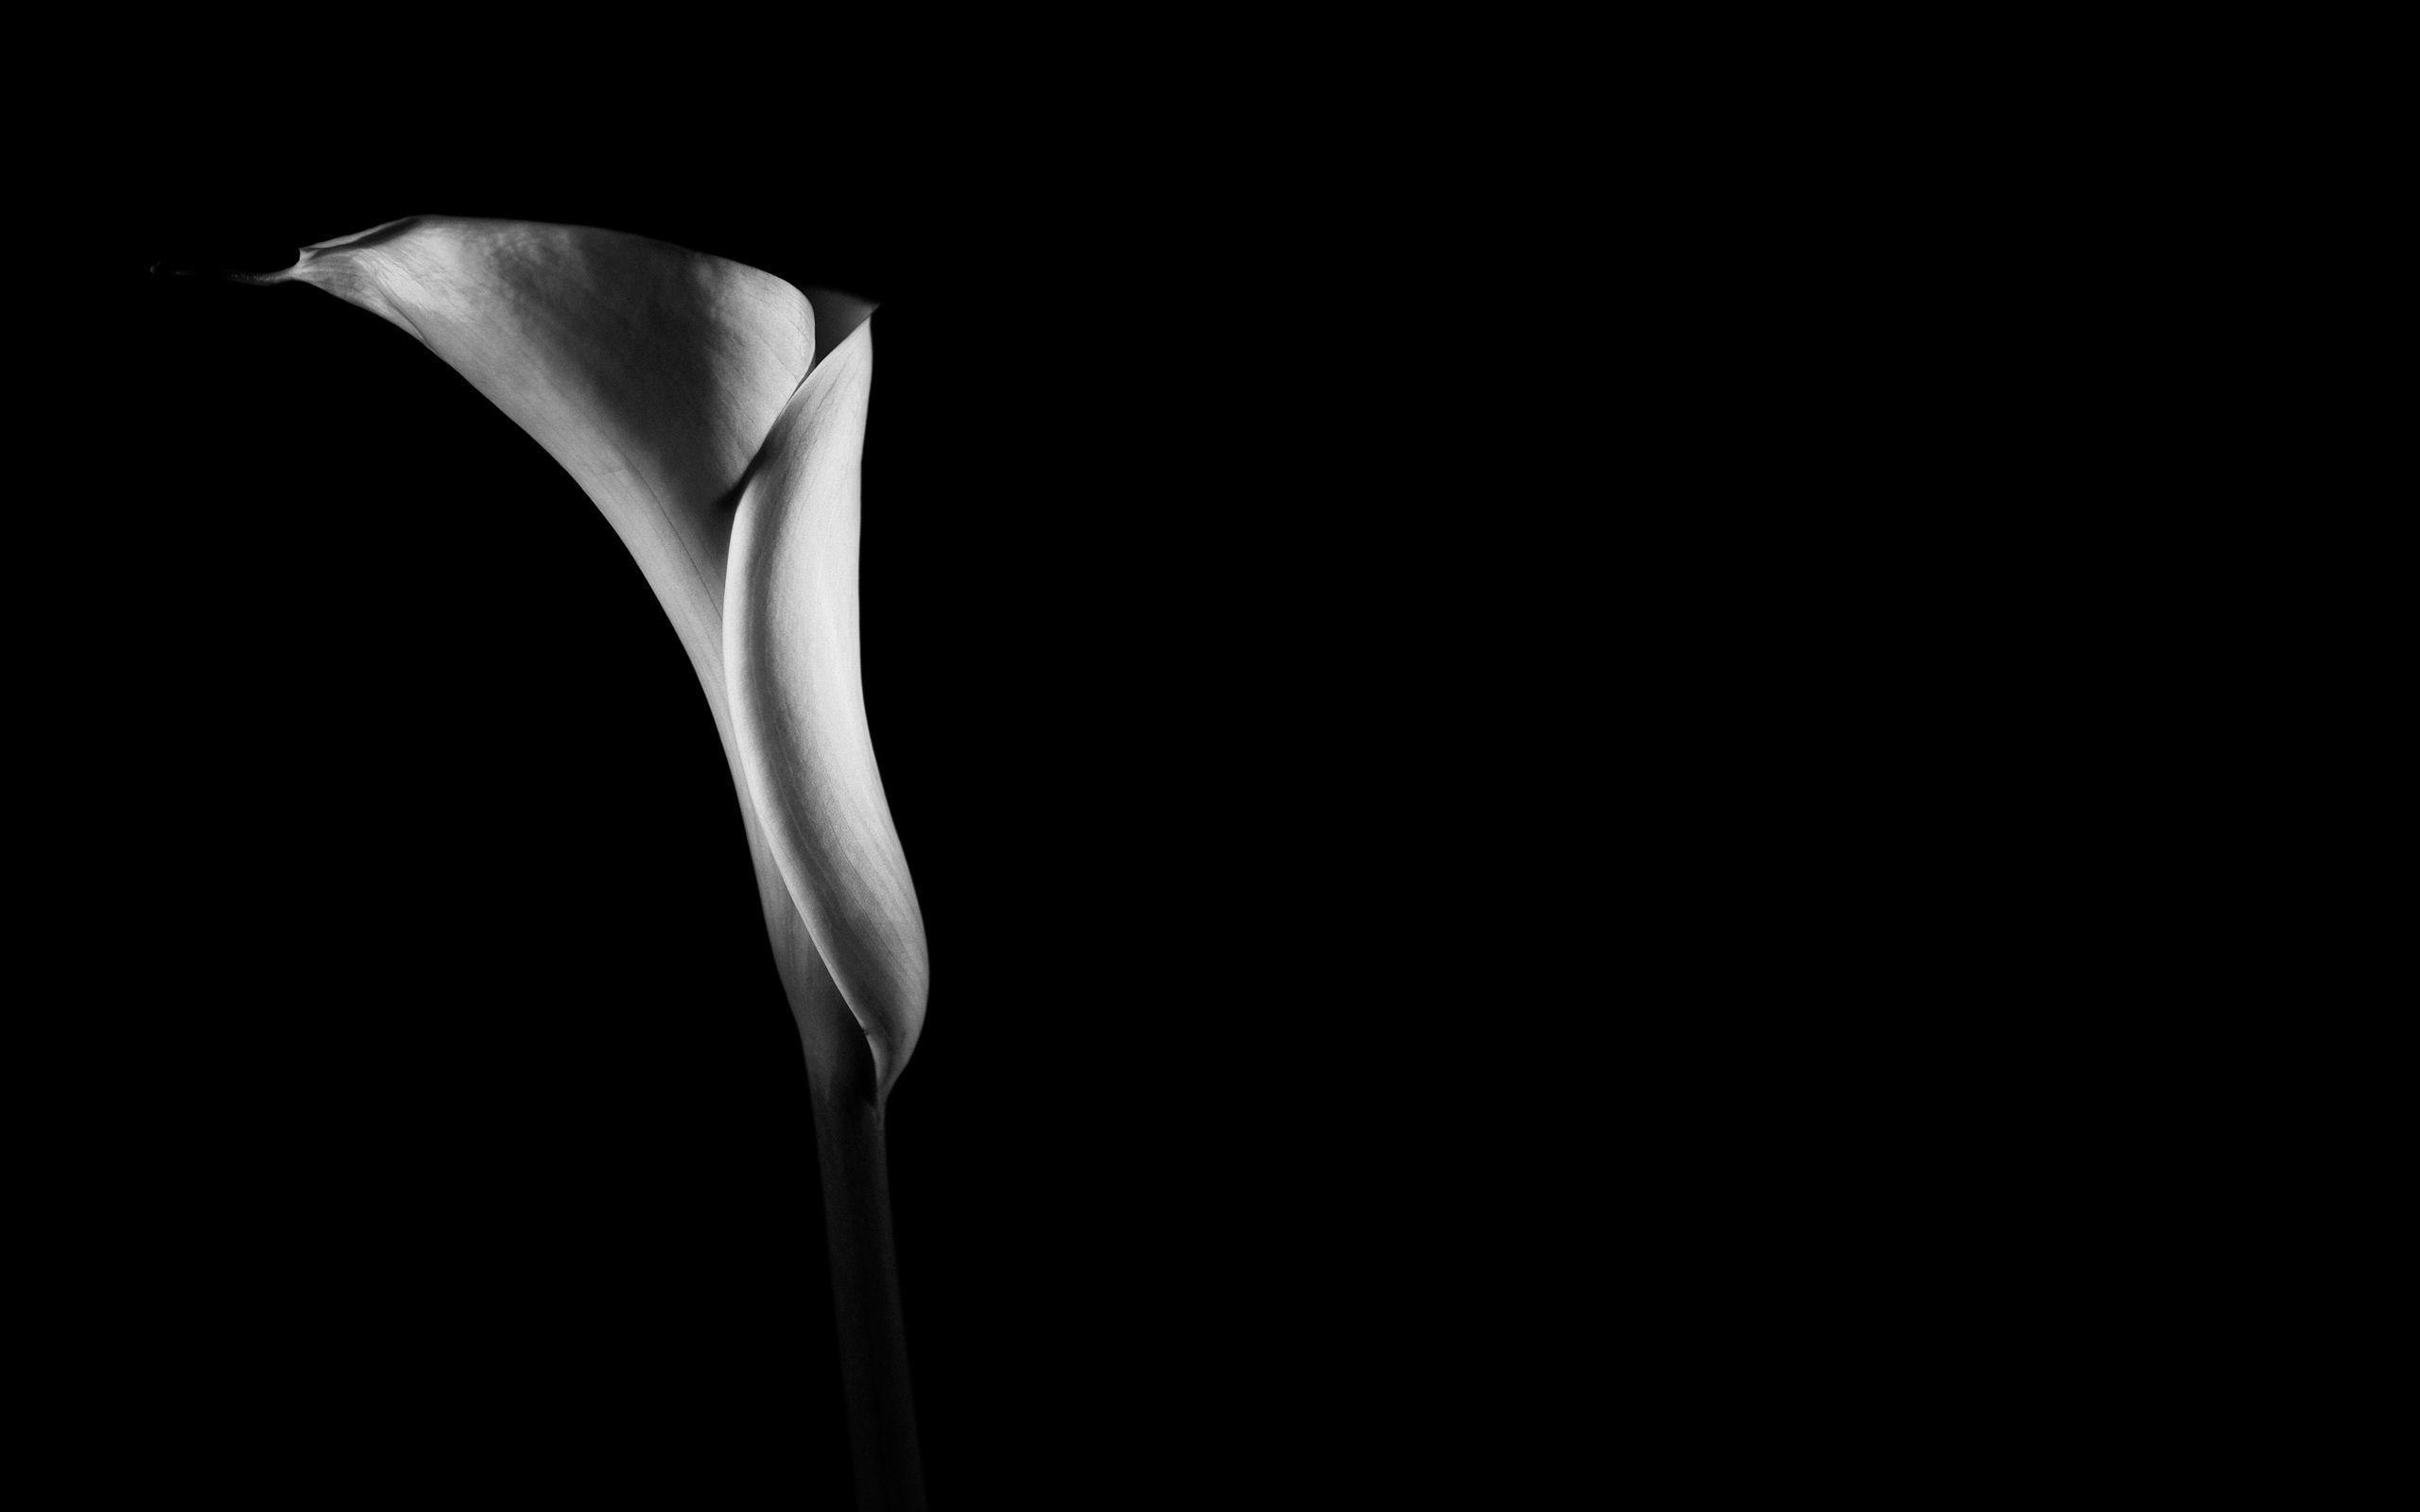 Photo black and white flower wallpaper.